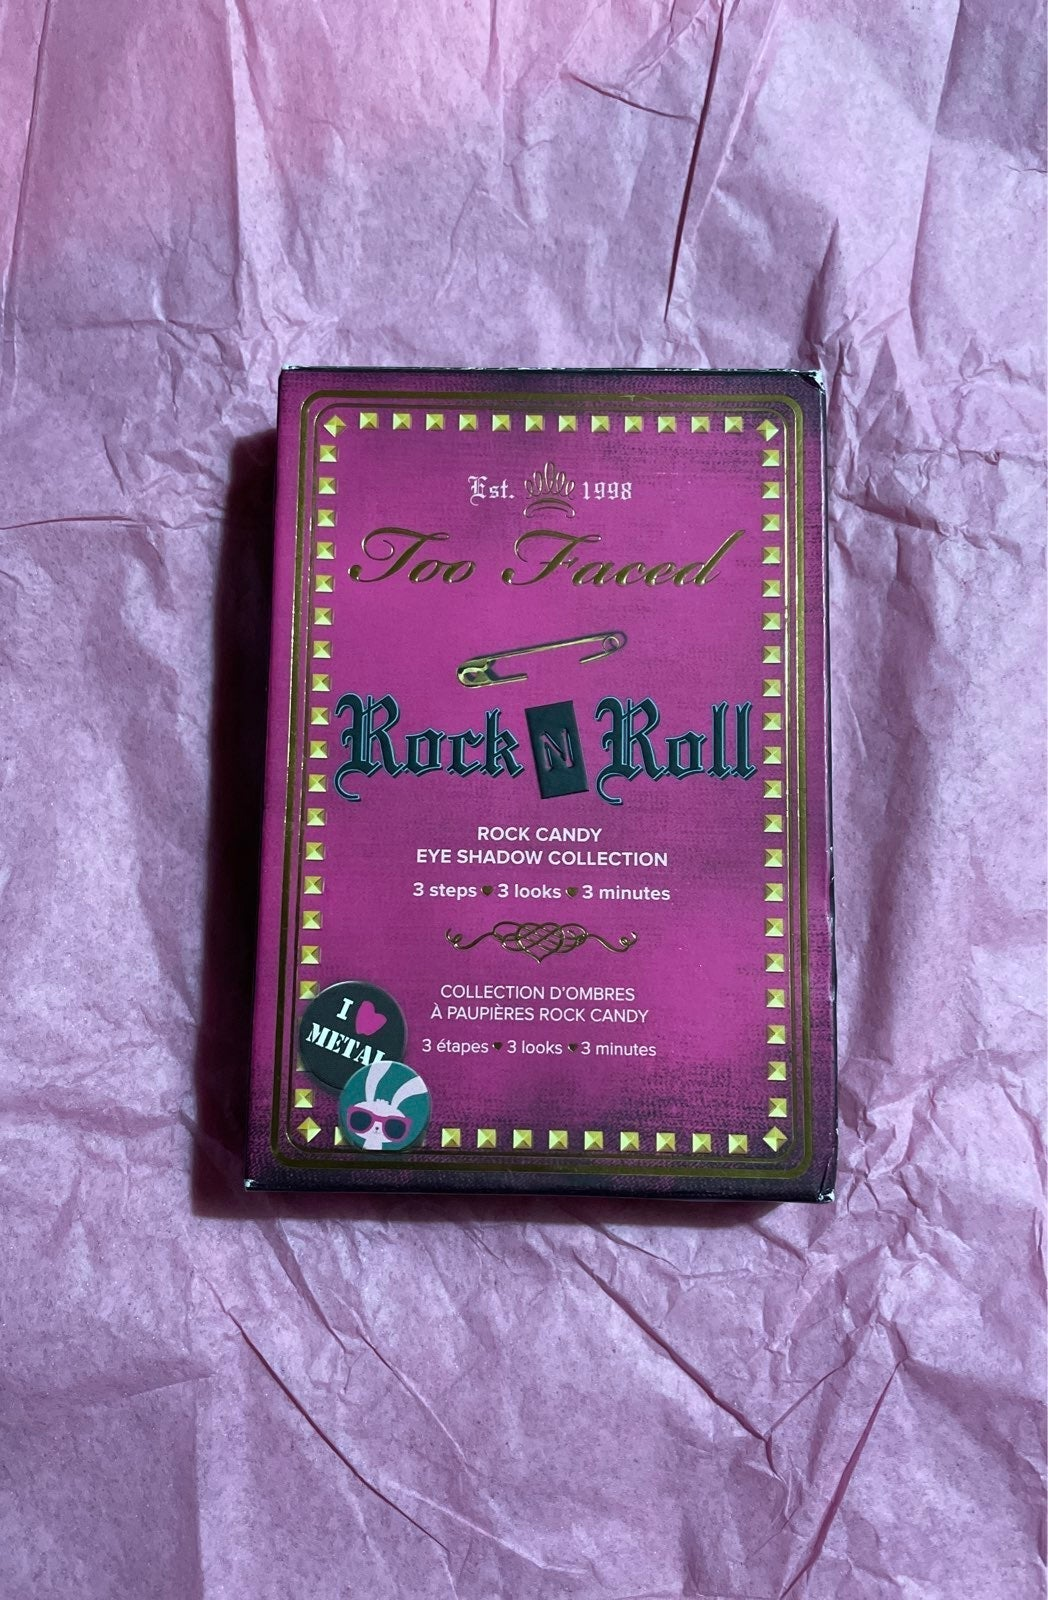 Too Faced Rock N Roll pallette NIB